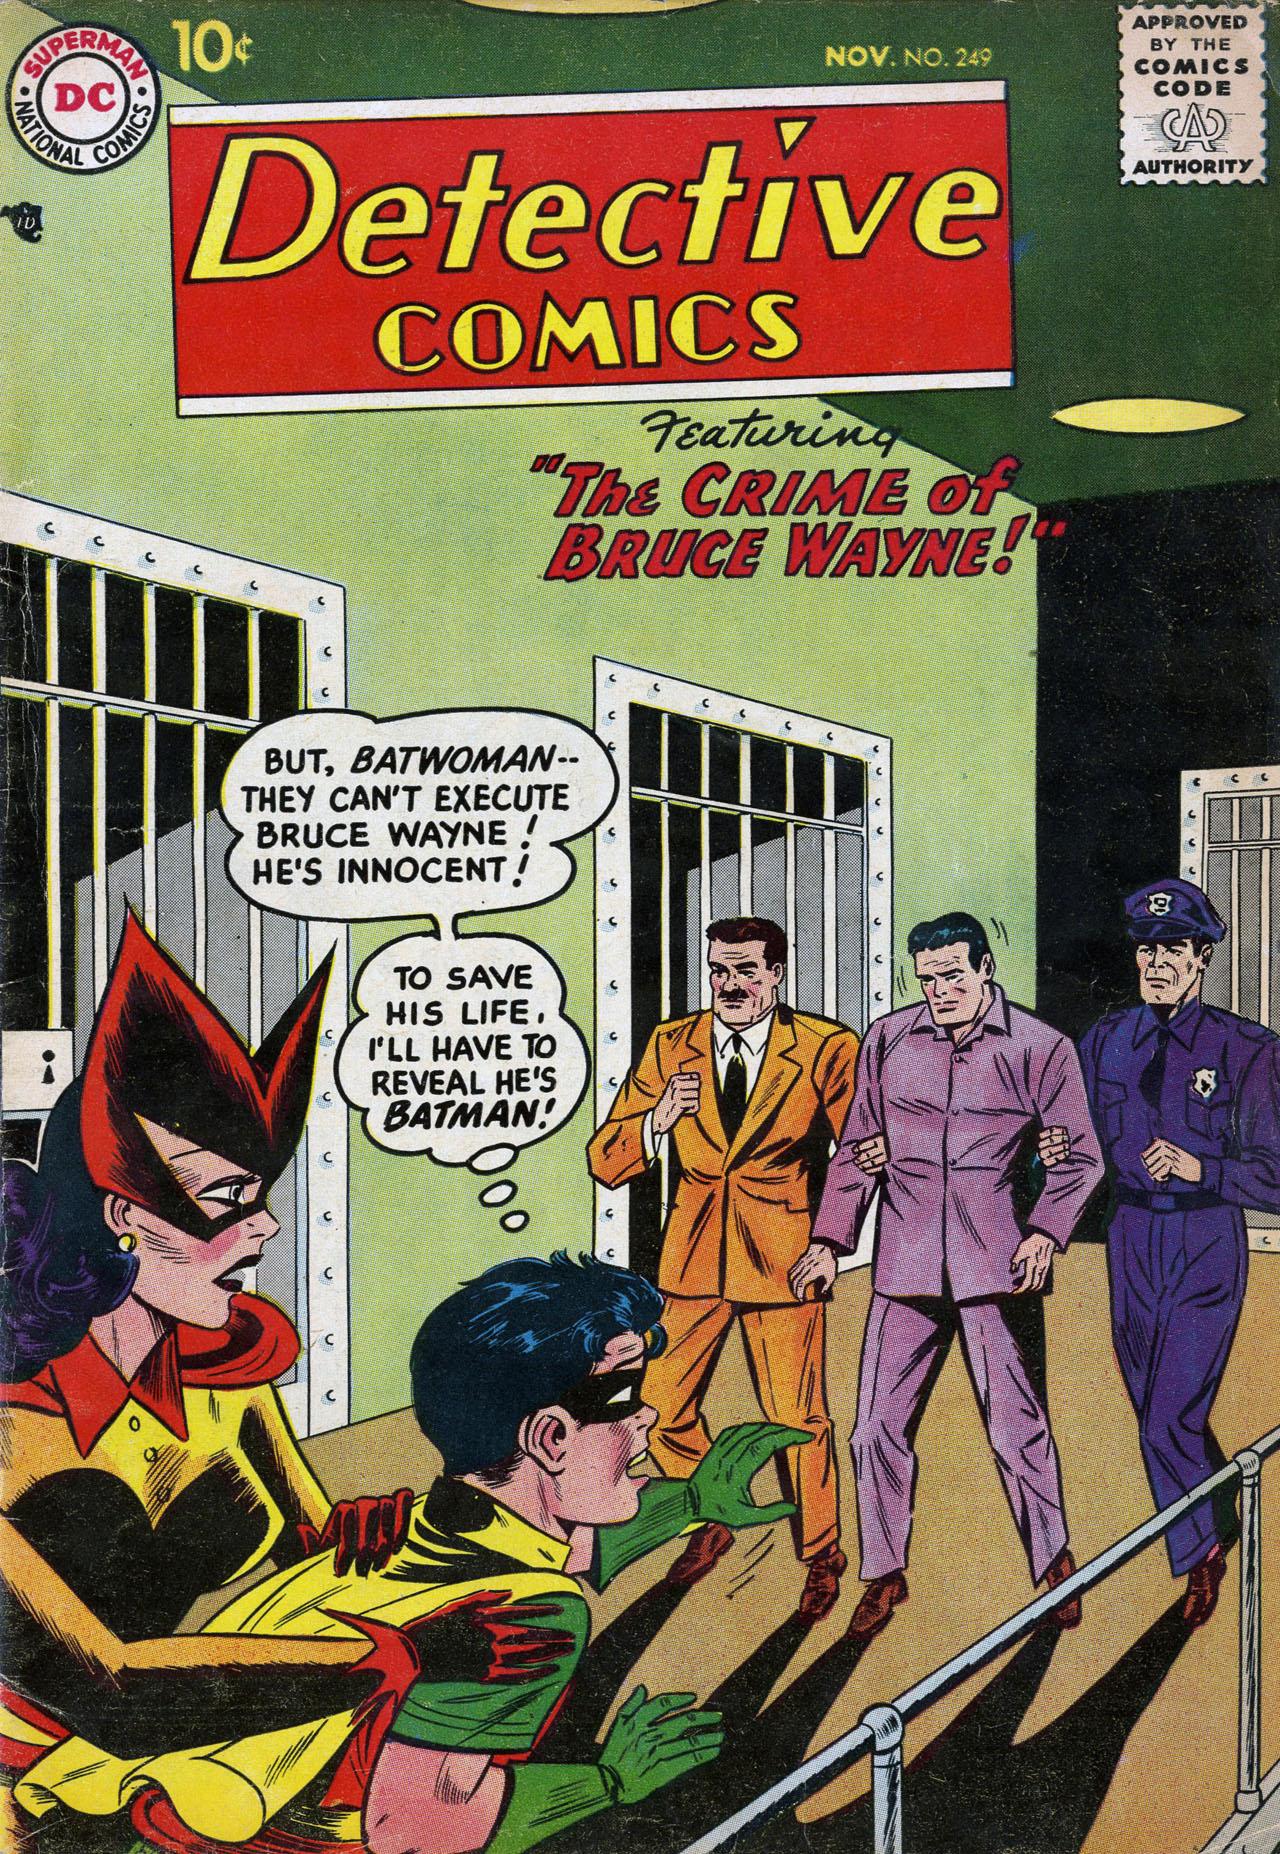 Read online Detective Comics (1937) comic -  Issue #249 - 1